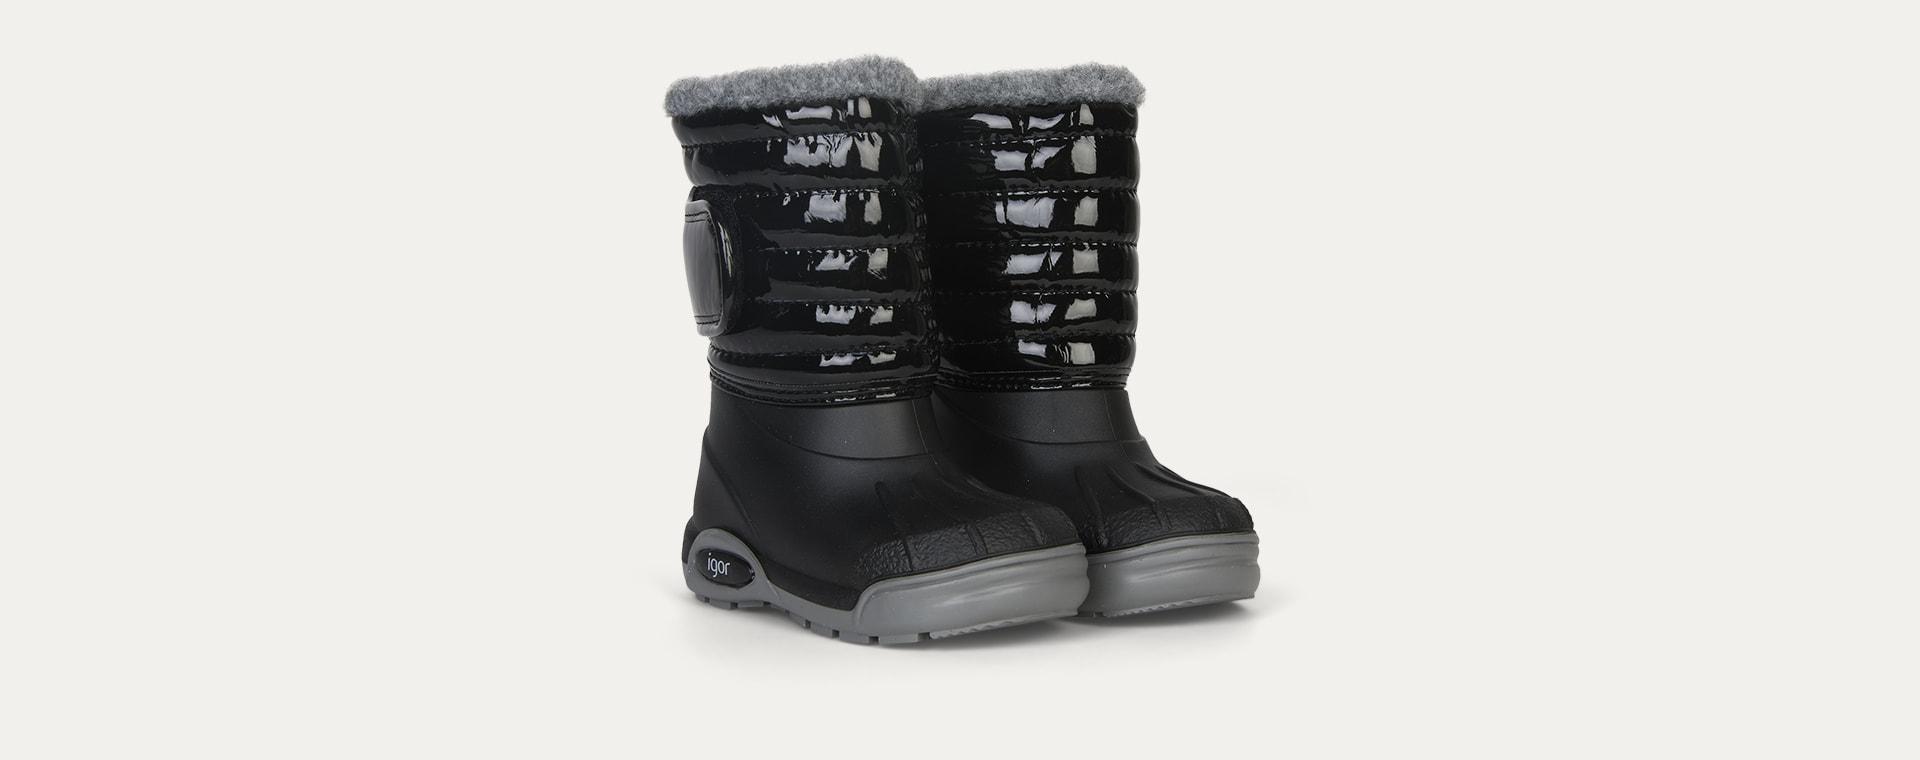 Black igor Topo Ski Boot